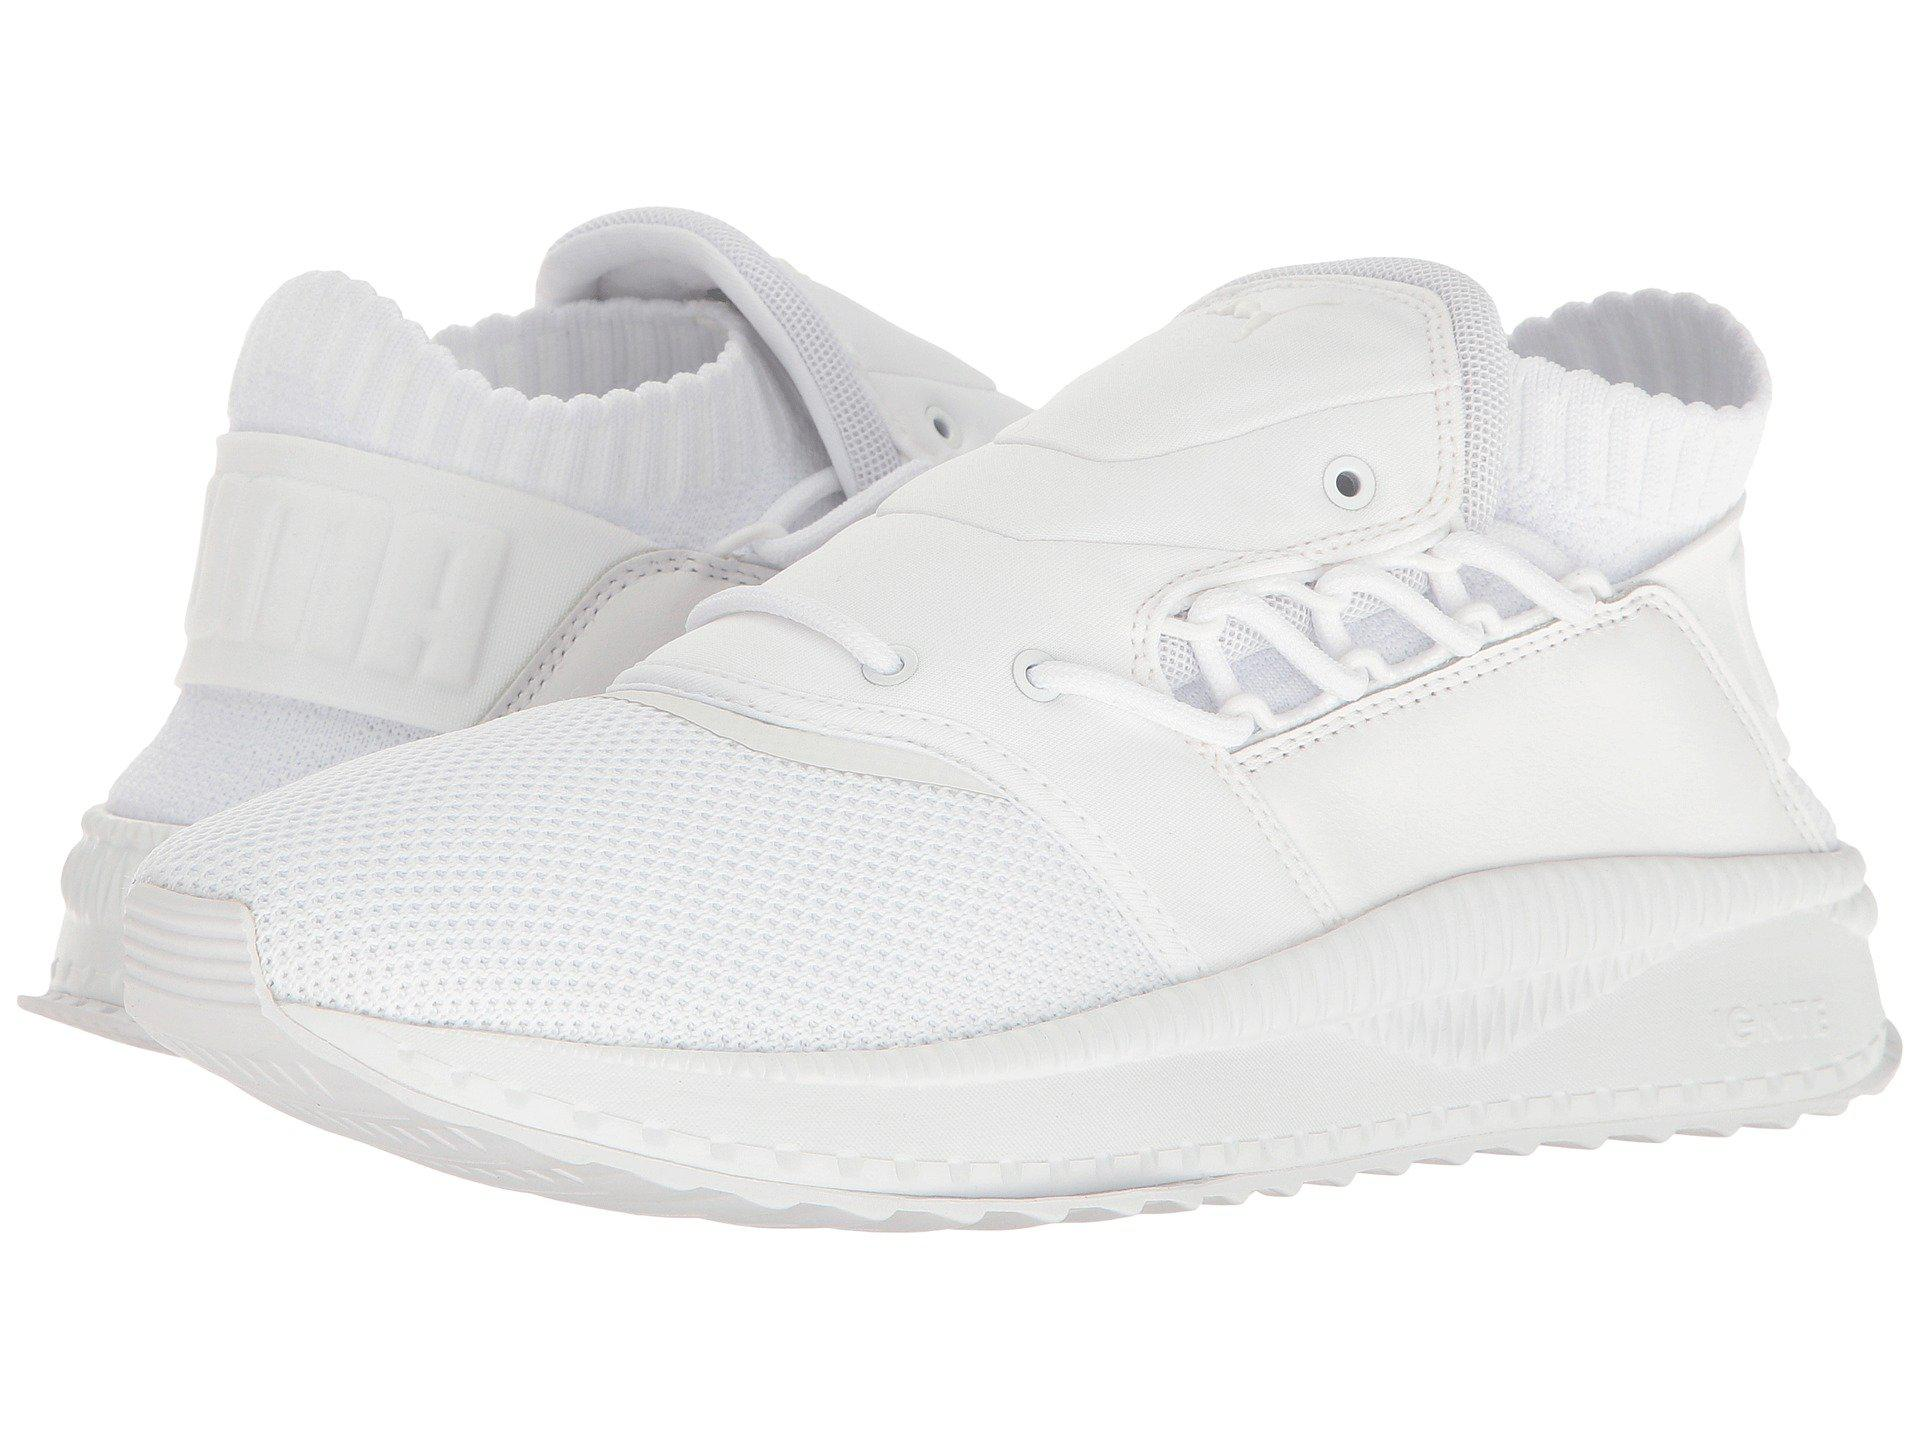 295abfa6601a Lyst - PUMA Tsugi Shinsei in White for Men